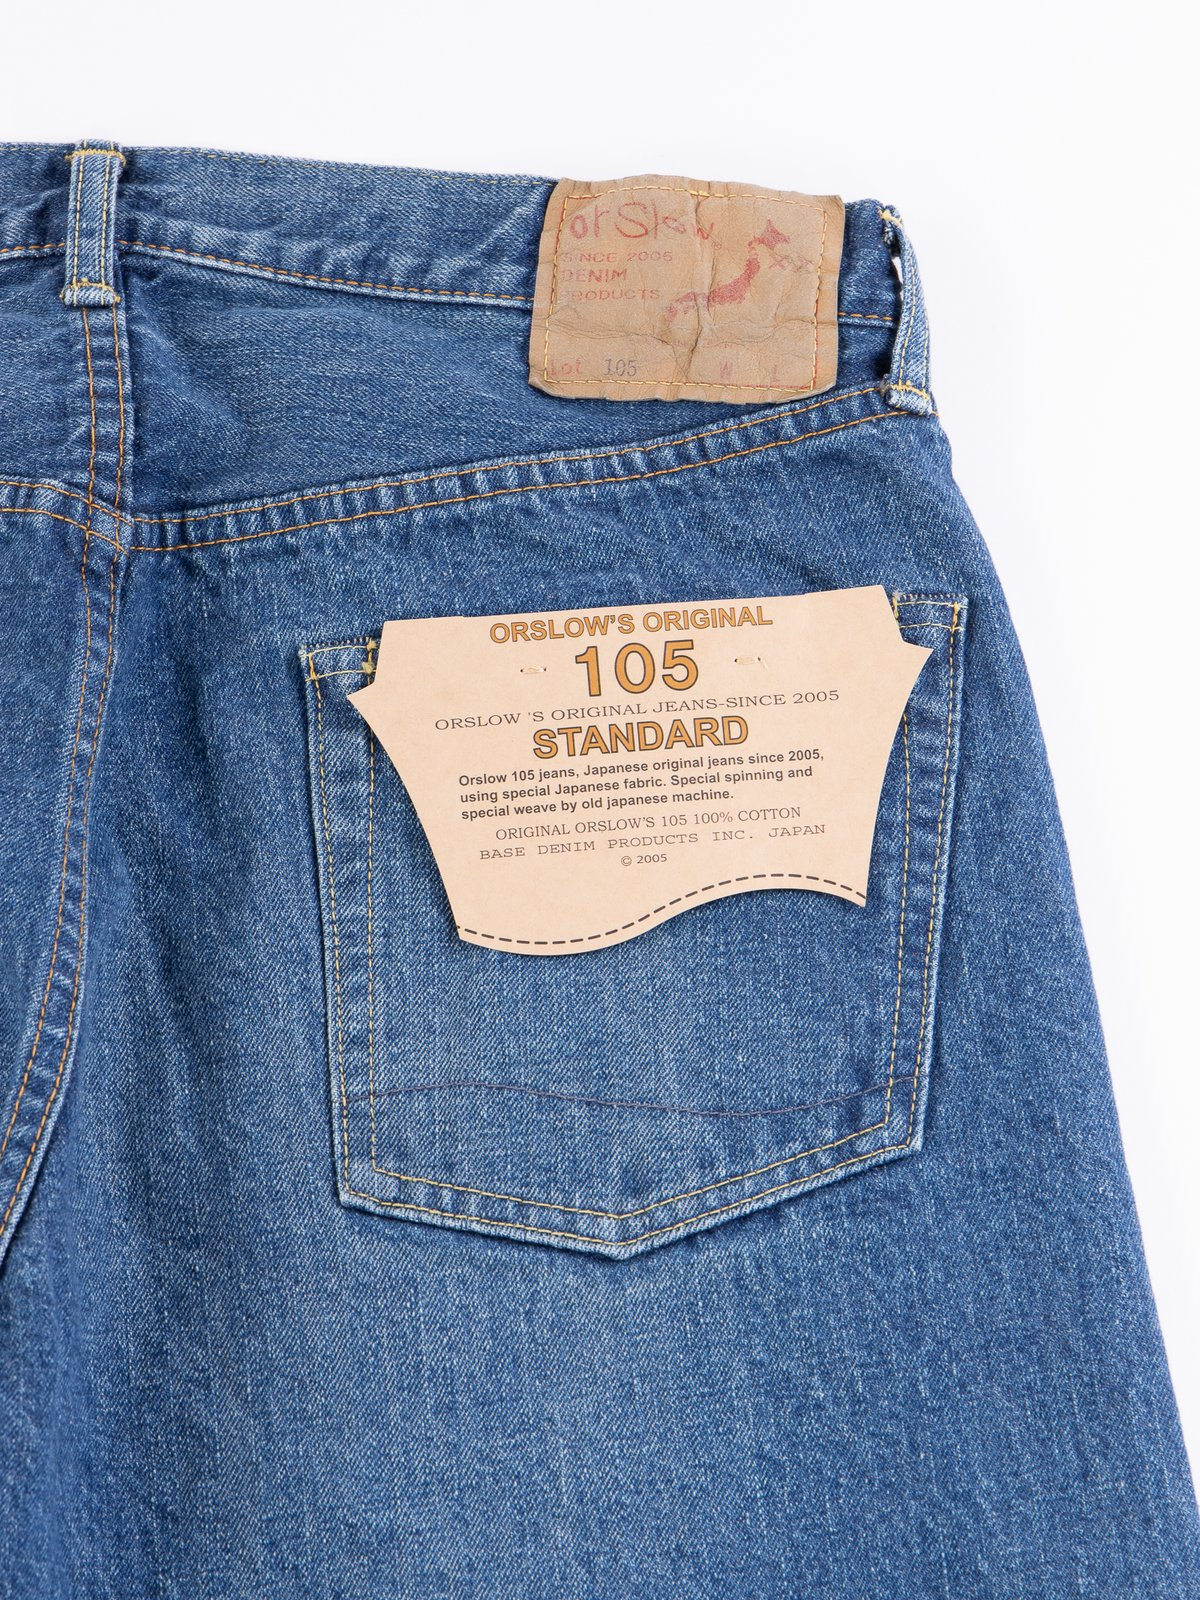 2 Year Wash 105 Standard 5 Pocket Jean - Image 6